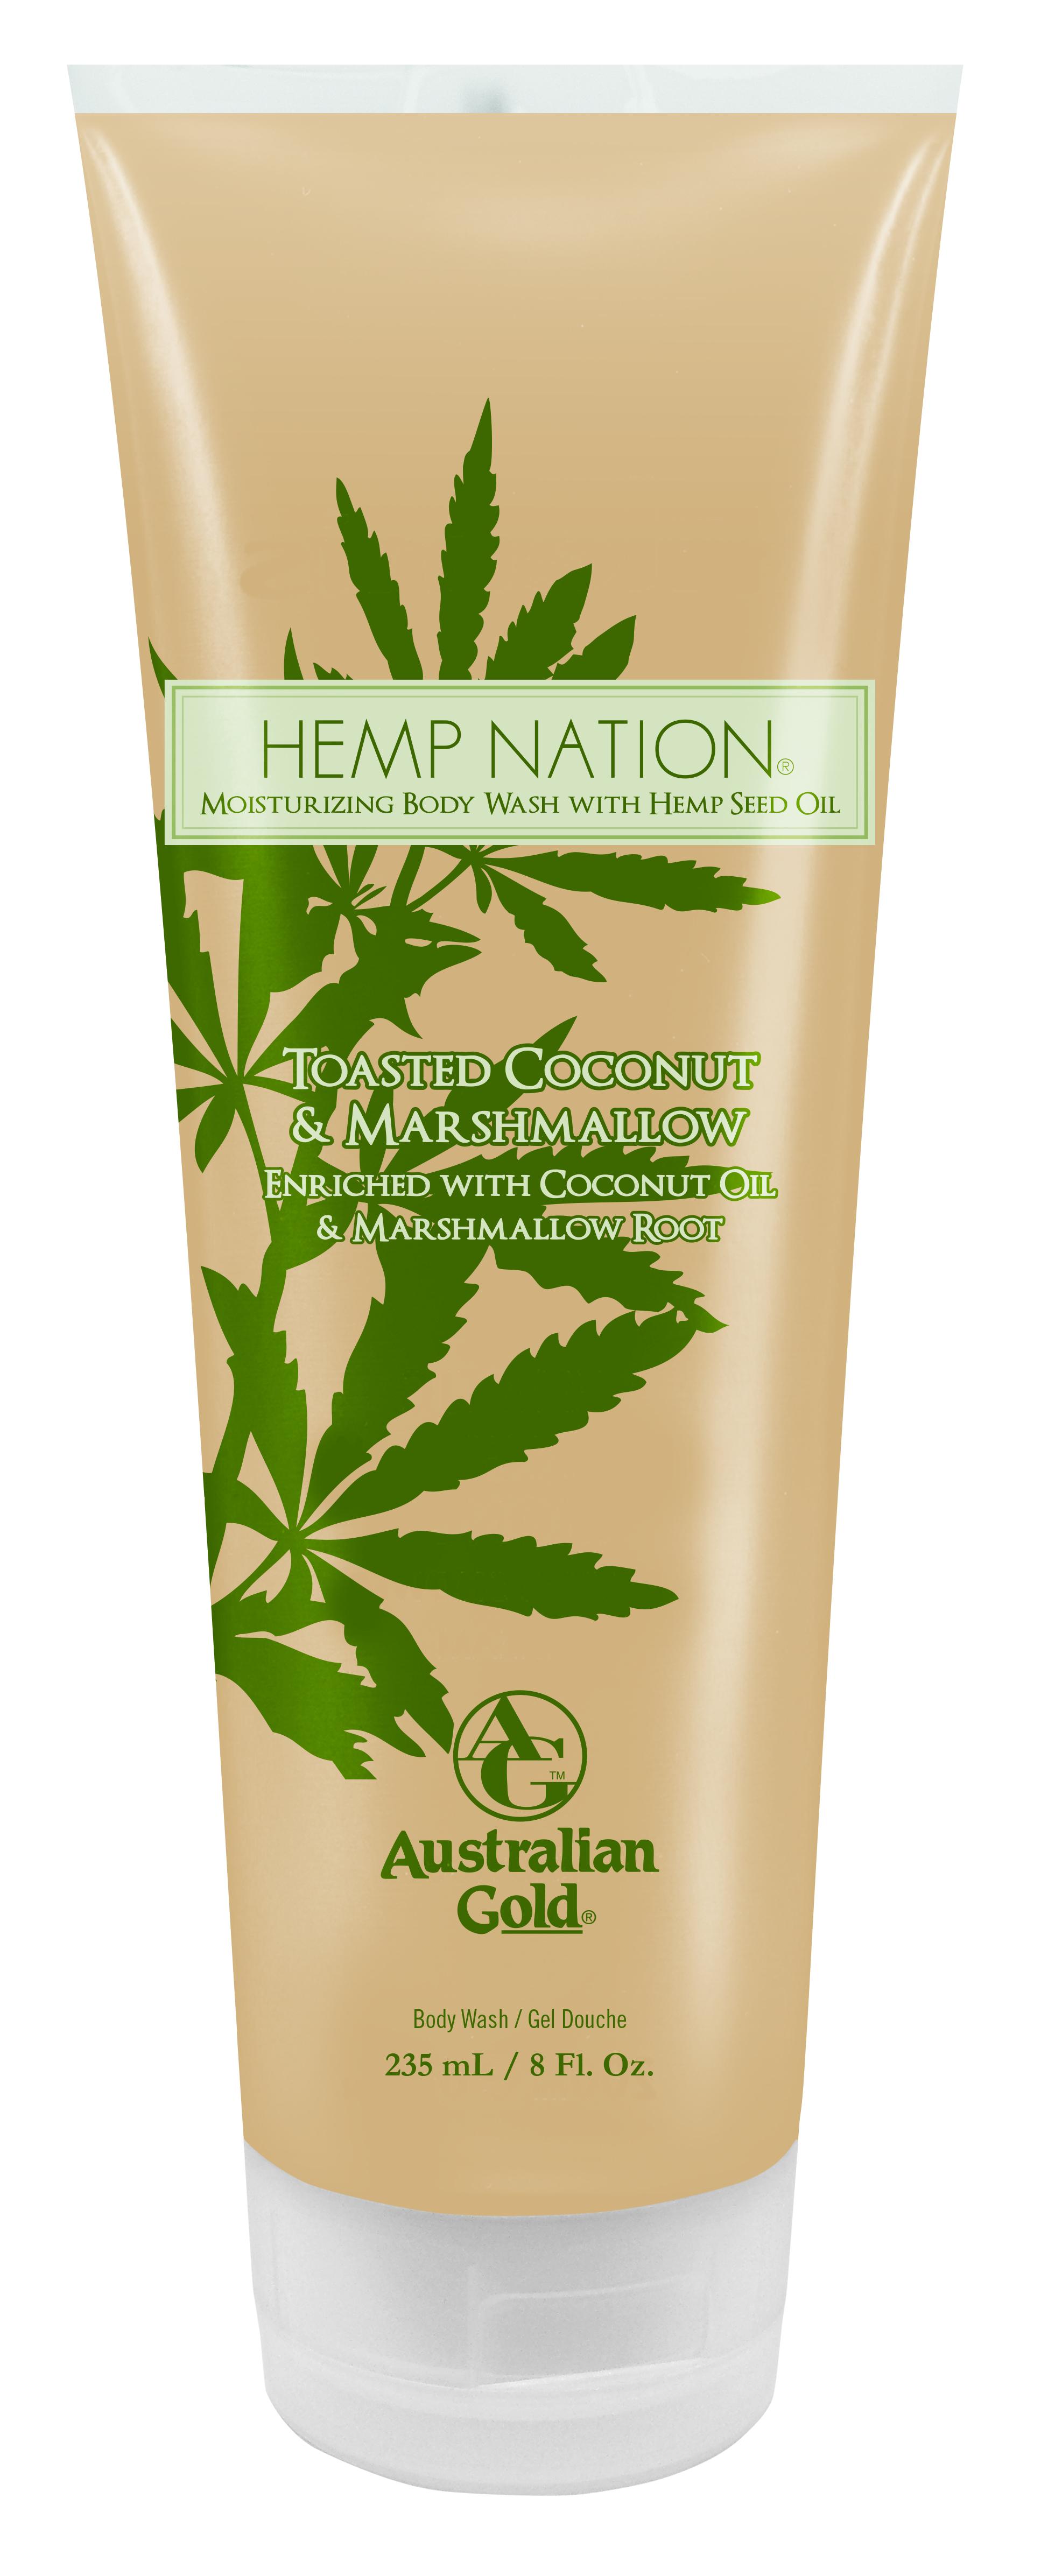 Hemp Nation® Toasted Coconut & Marshmallow Body Wash